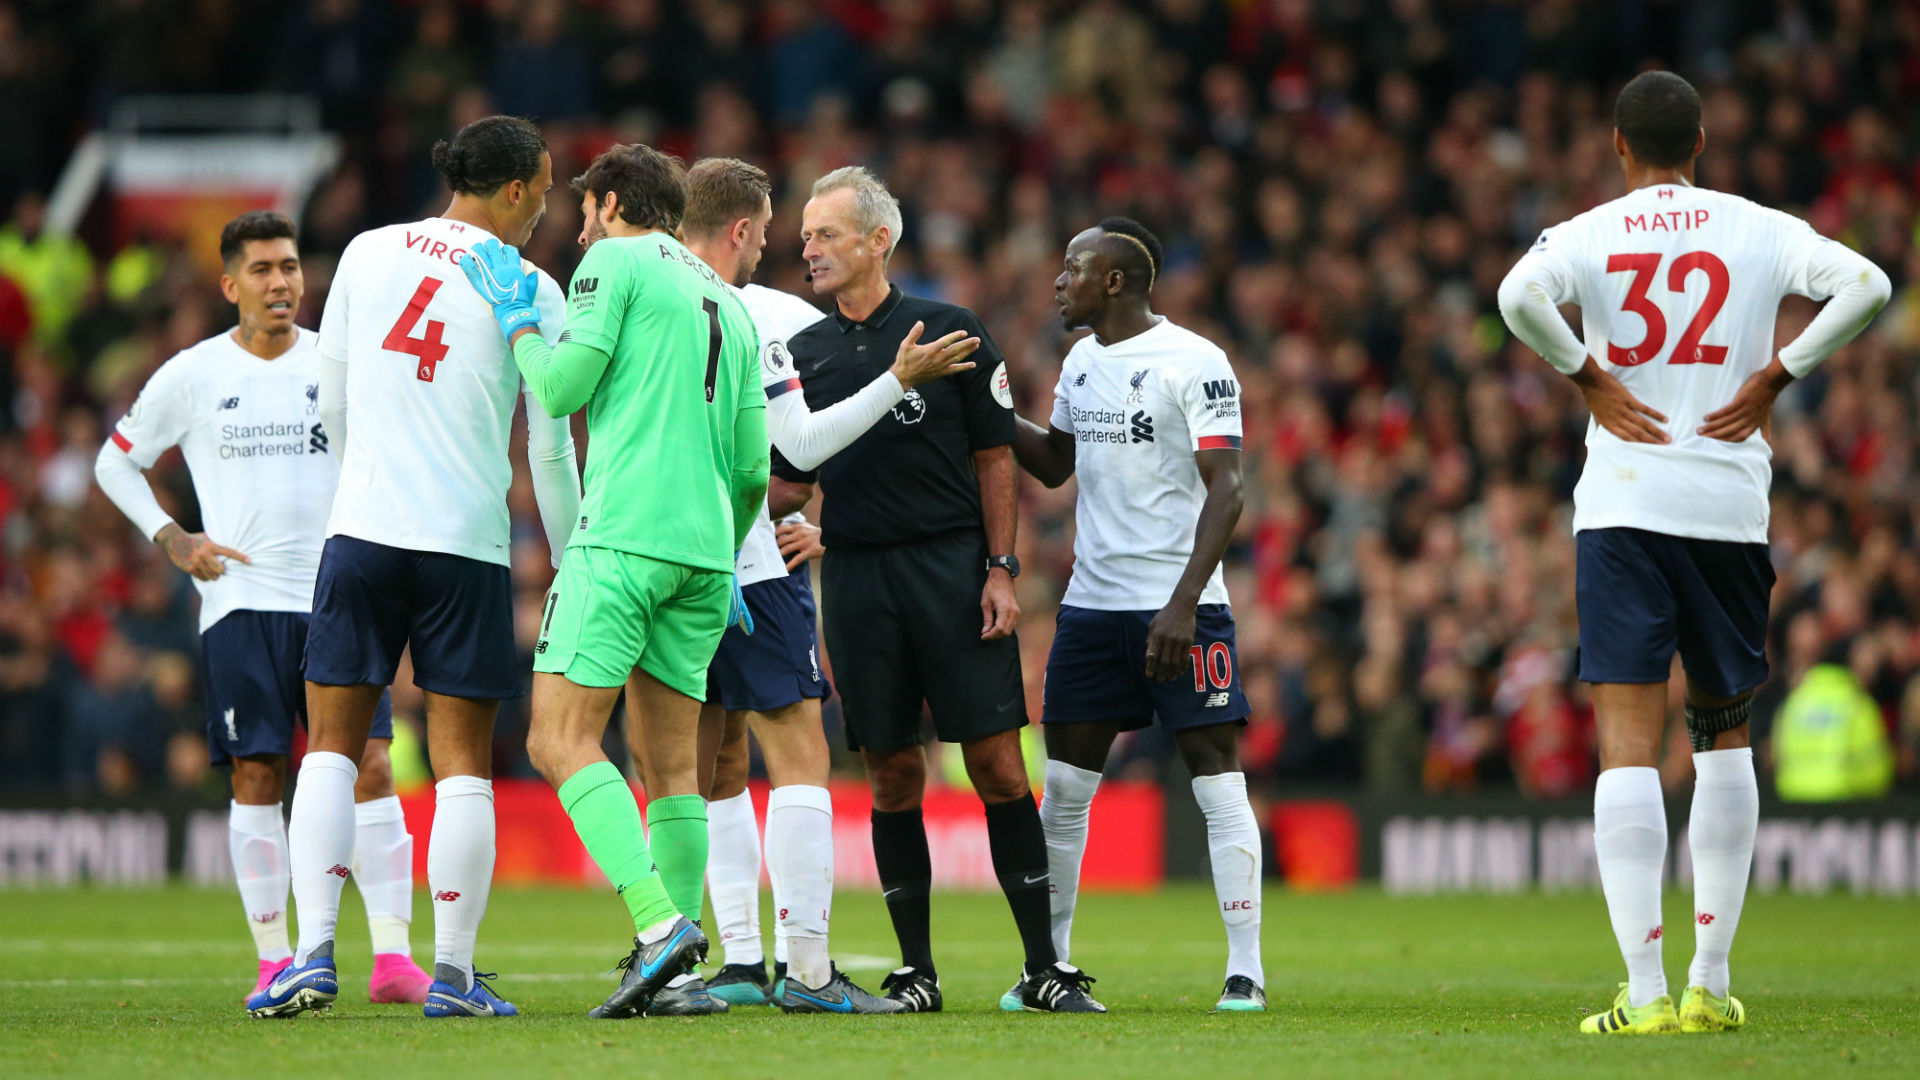 Man United halt Liverpool's winning streak as Man City close the gap - the Premier League Data Diary